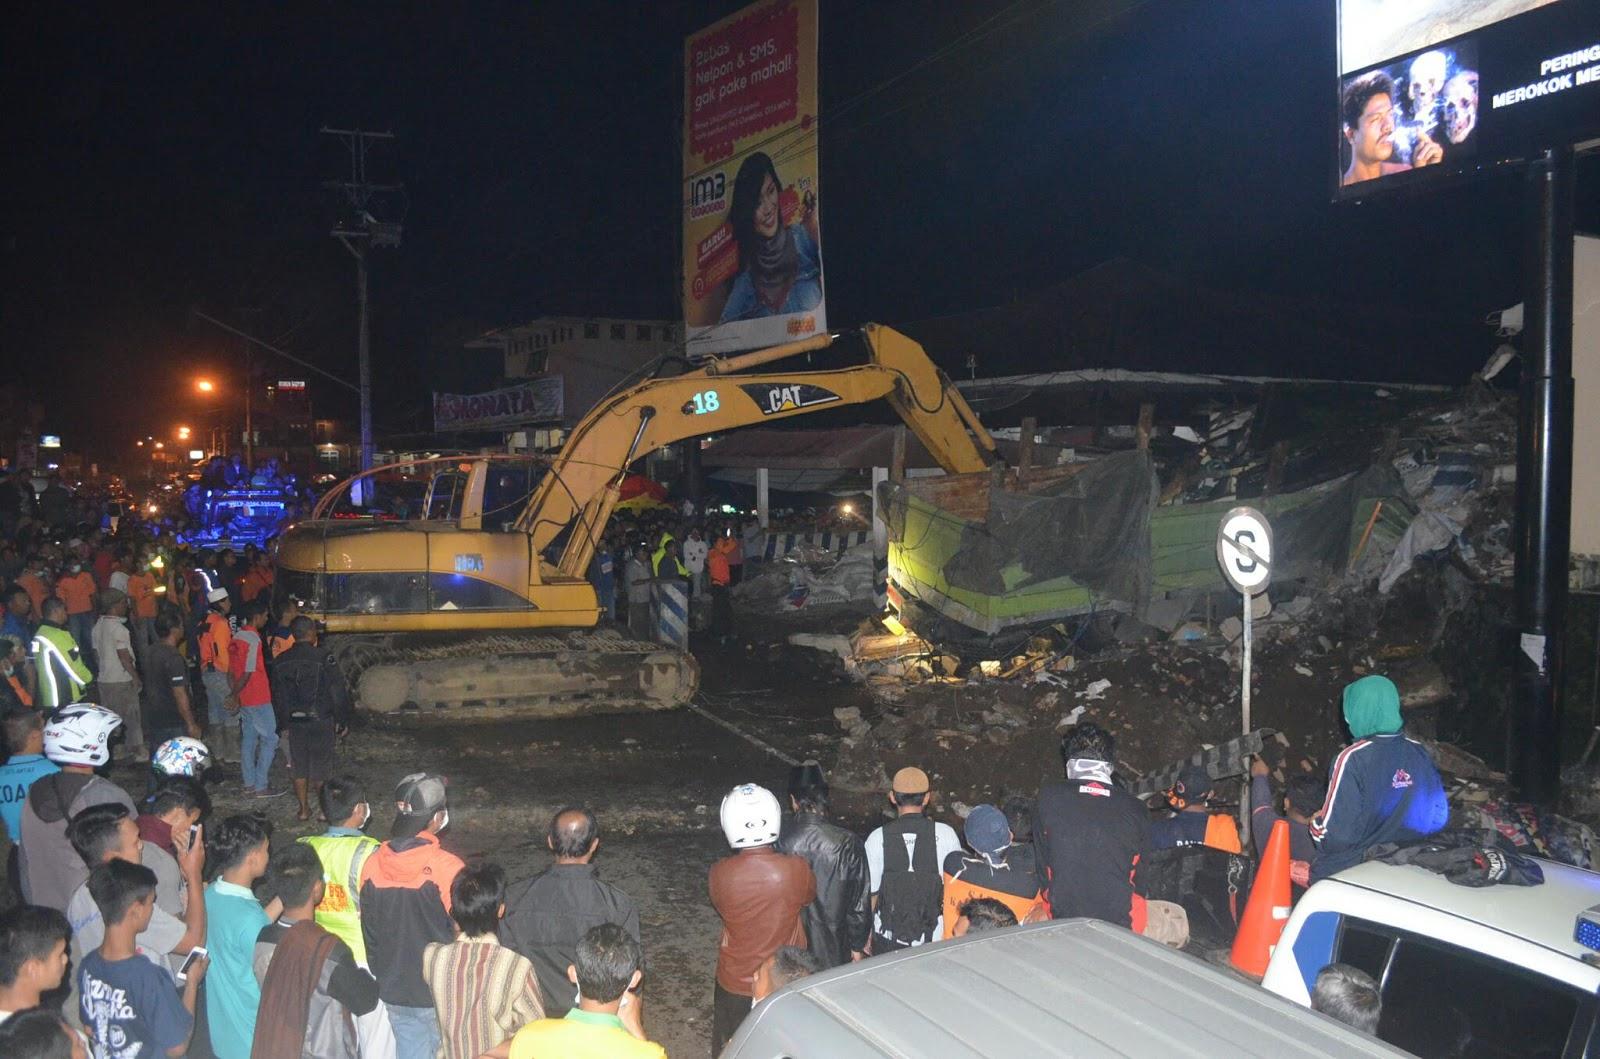 2 Alat Berat Evakuasi Truk Tabrak Pos Polisi Wonosobo Jual